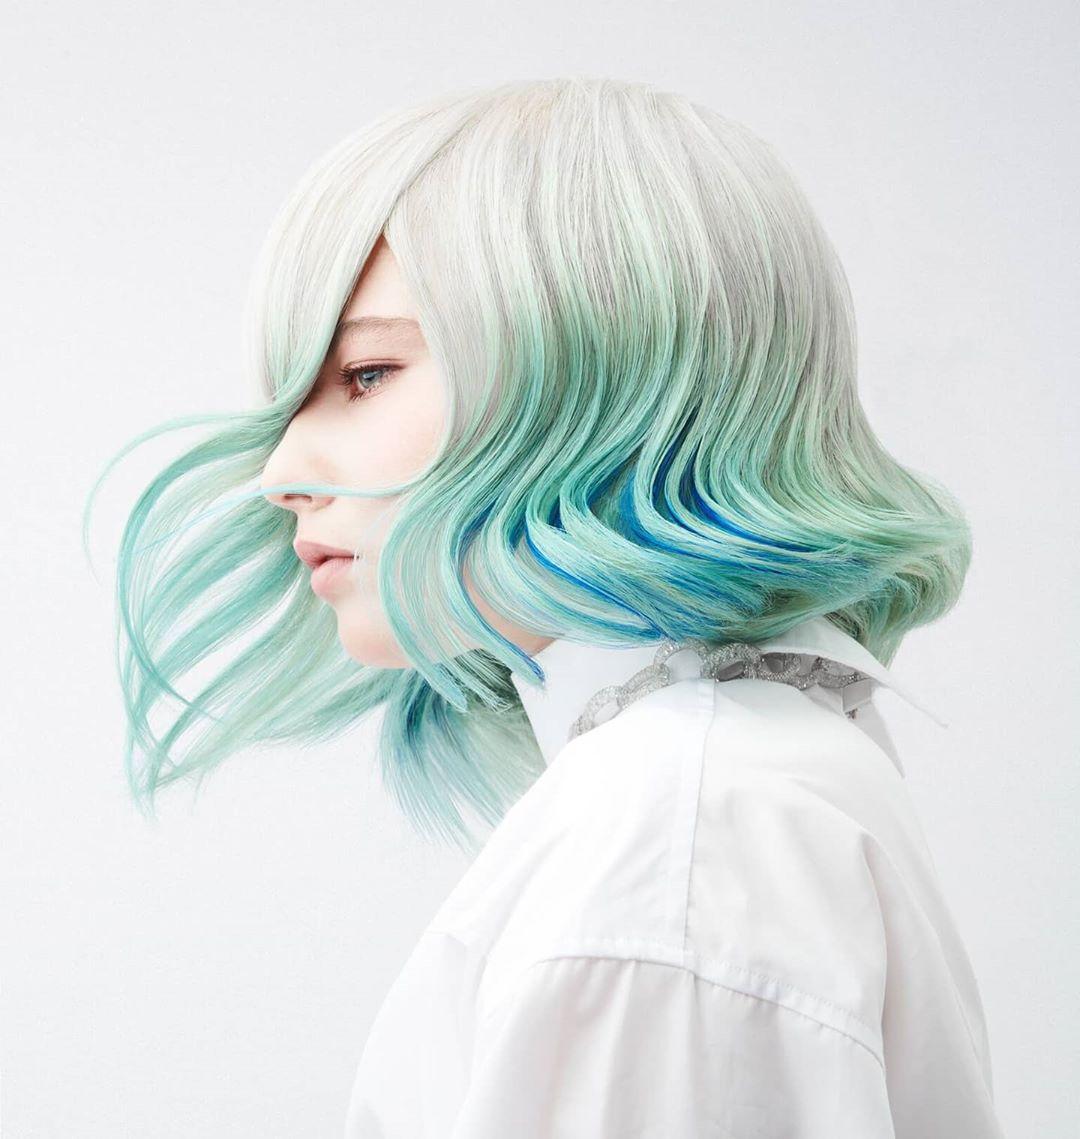 rita_hairstyle_spb_